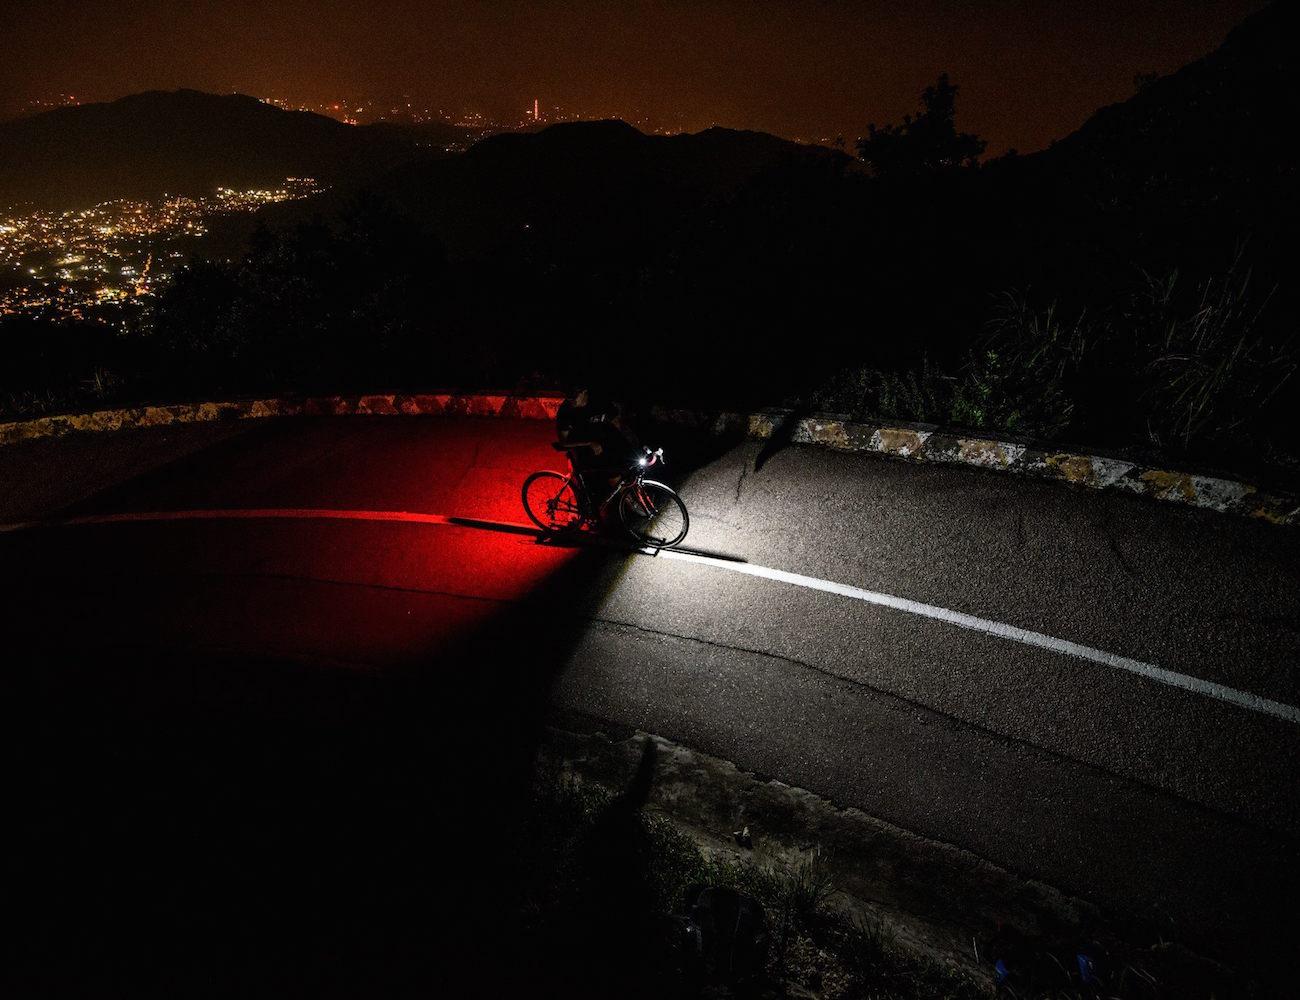 Stellight – The Next Generation Smart Bike Light